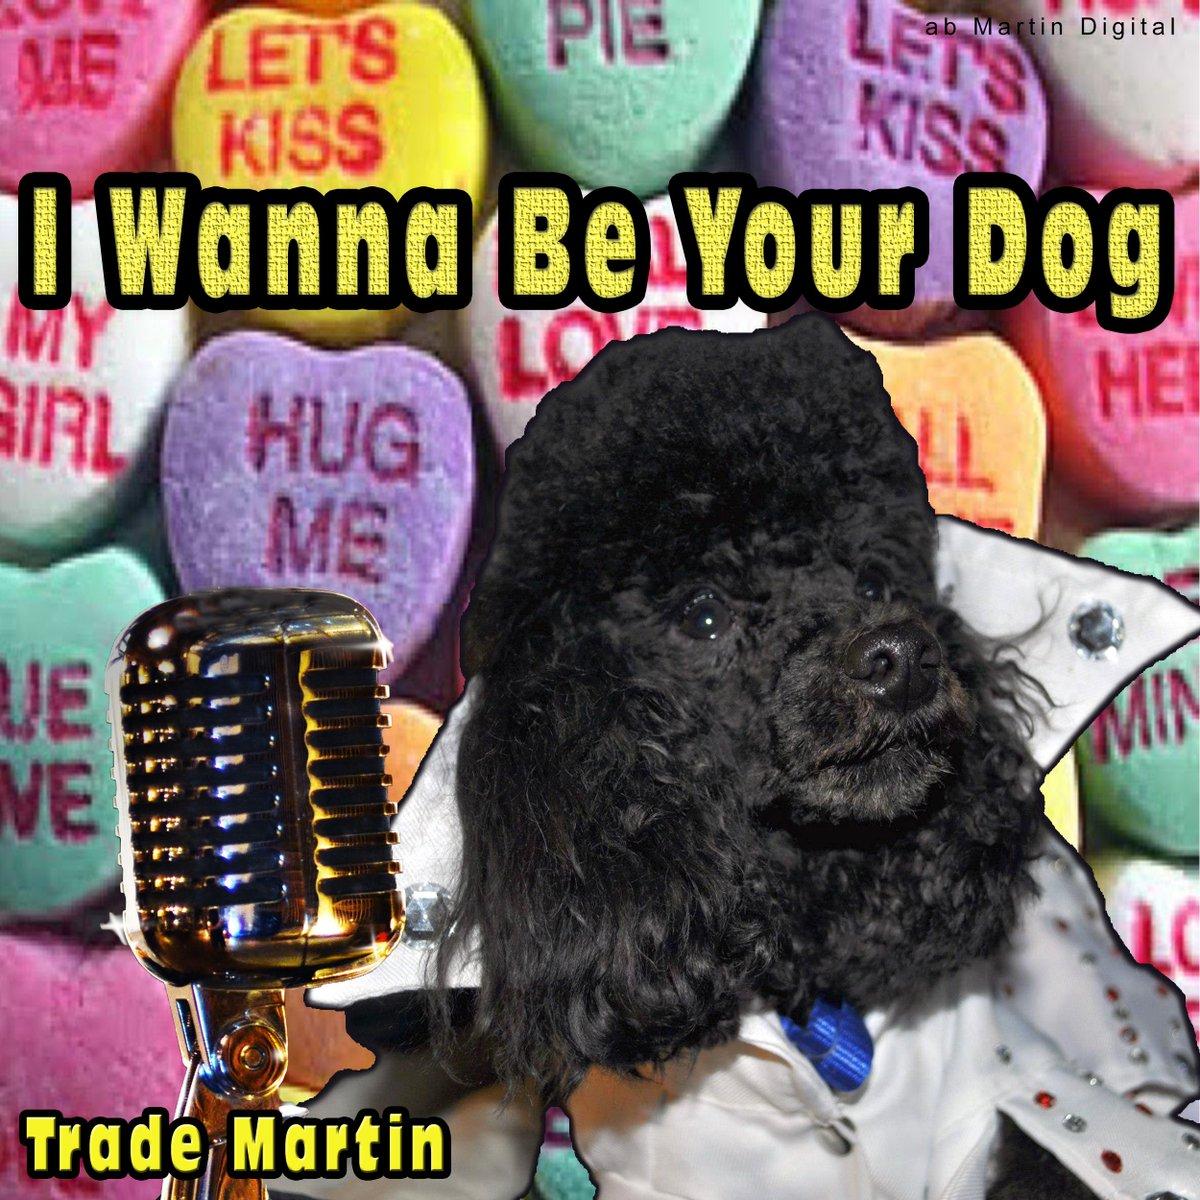 @TutMusicGroup .I Wanna Be Your Dog https://www.youtube.com/watch?v=1u9iszZKi1s… #trademartin #abMartinDigital #iTunes #Amazon #Spotify #AppleMusic